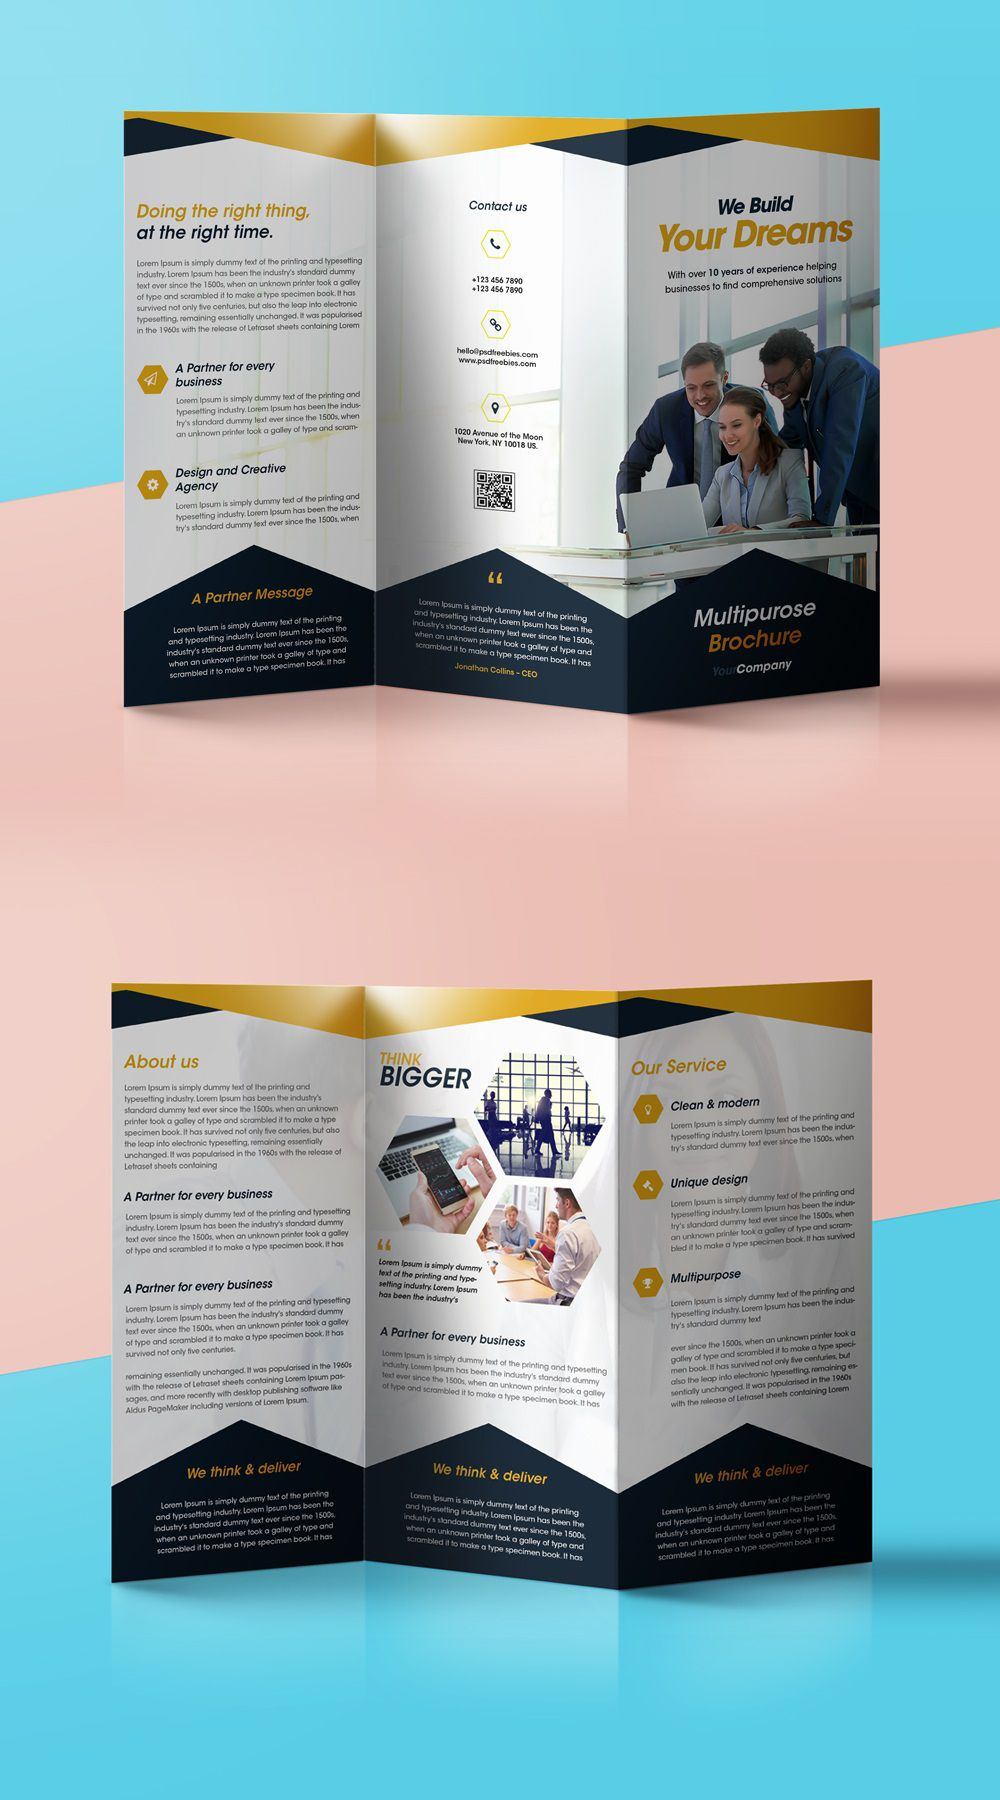 008 Fearsome Free Tri Fold Brochure Template Photo  Photoshop Illustrator Microsoft Word 2010Full